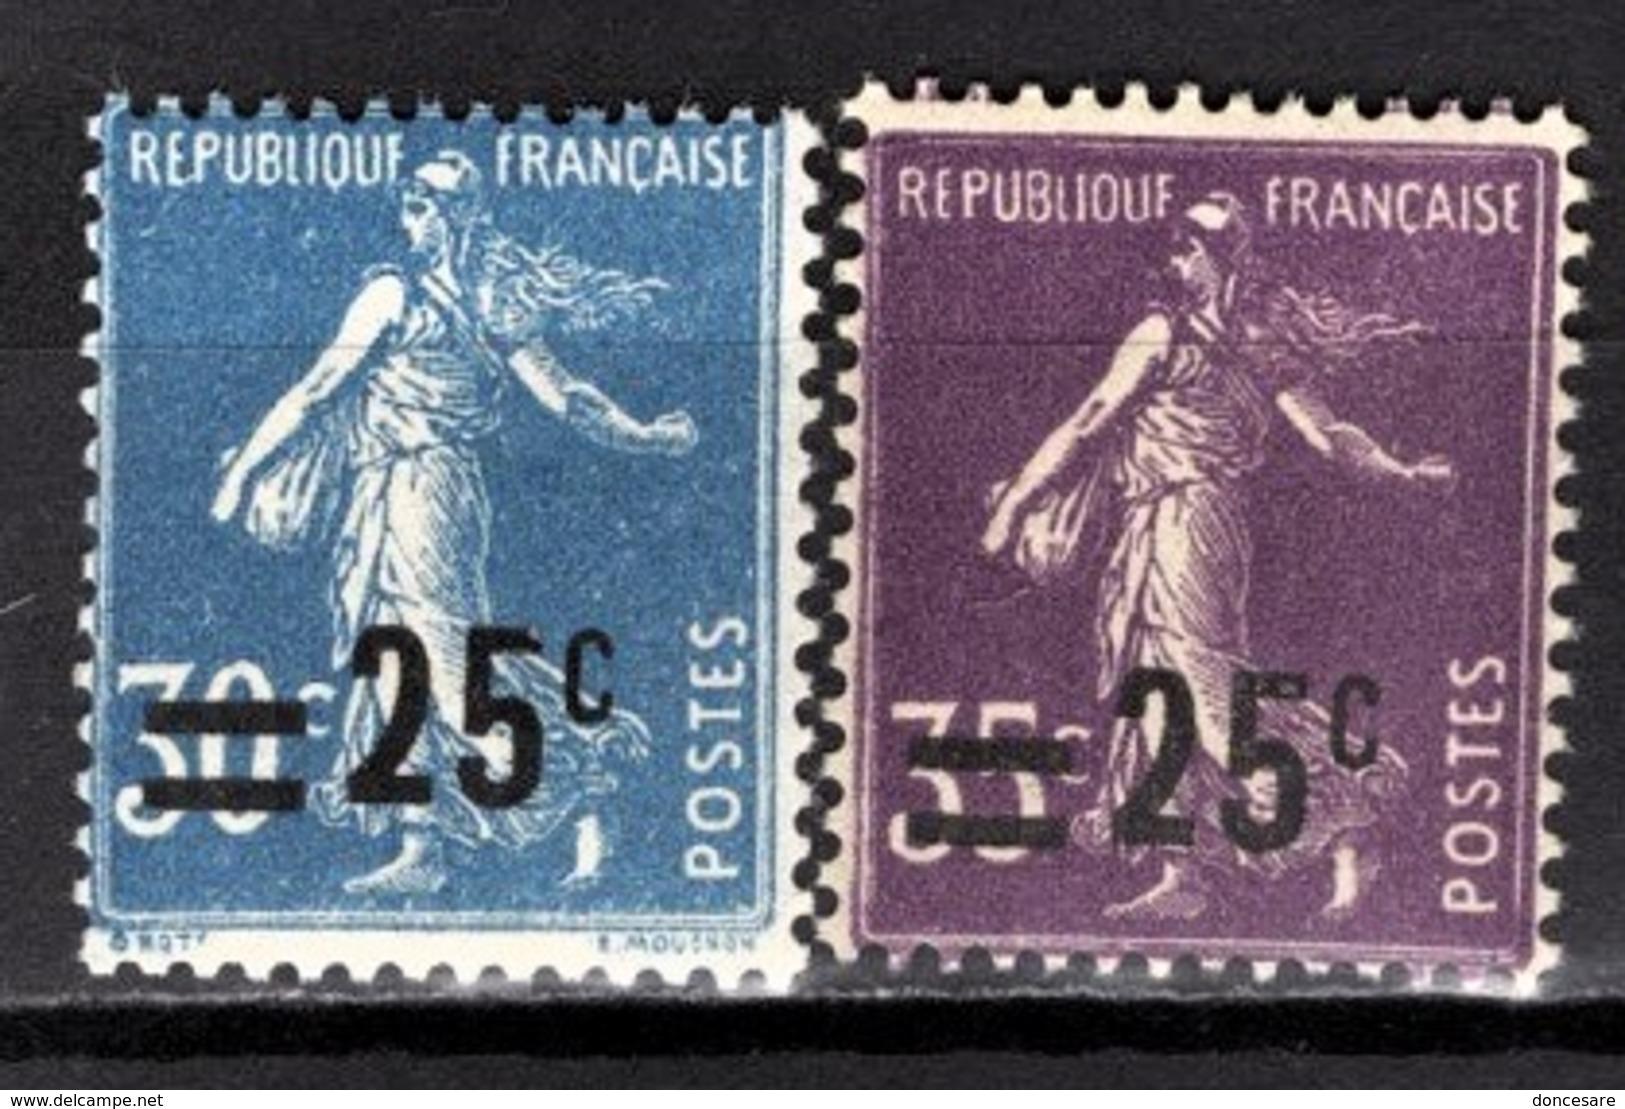 FRANCE 1925/1926 - Y.T. N° 217 ET 218 - NEUFS** - France